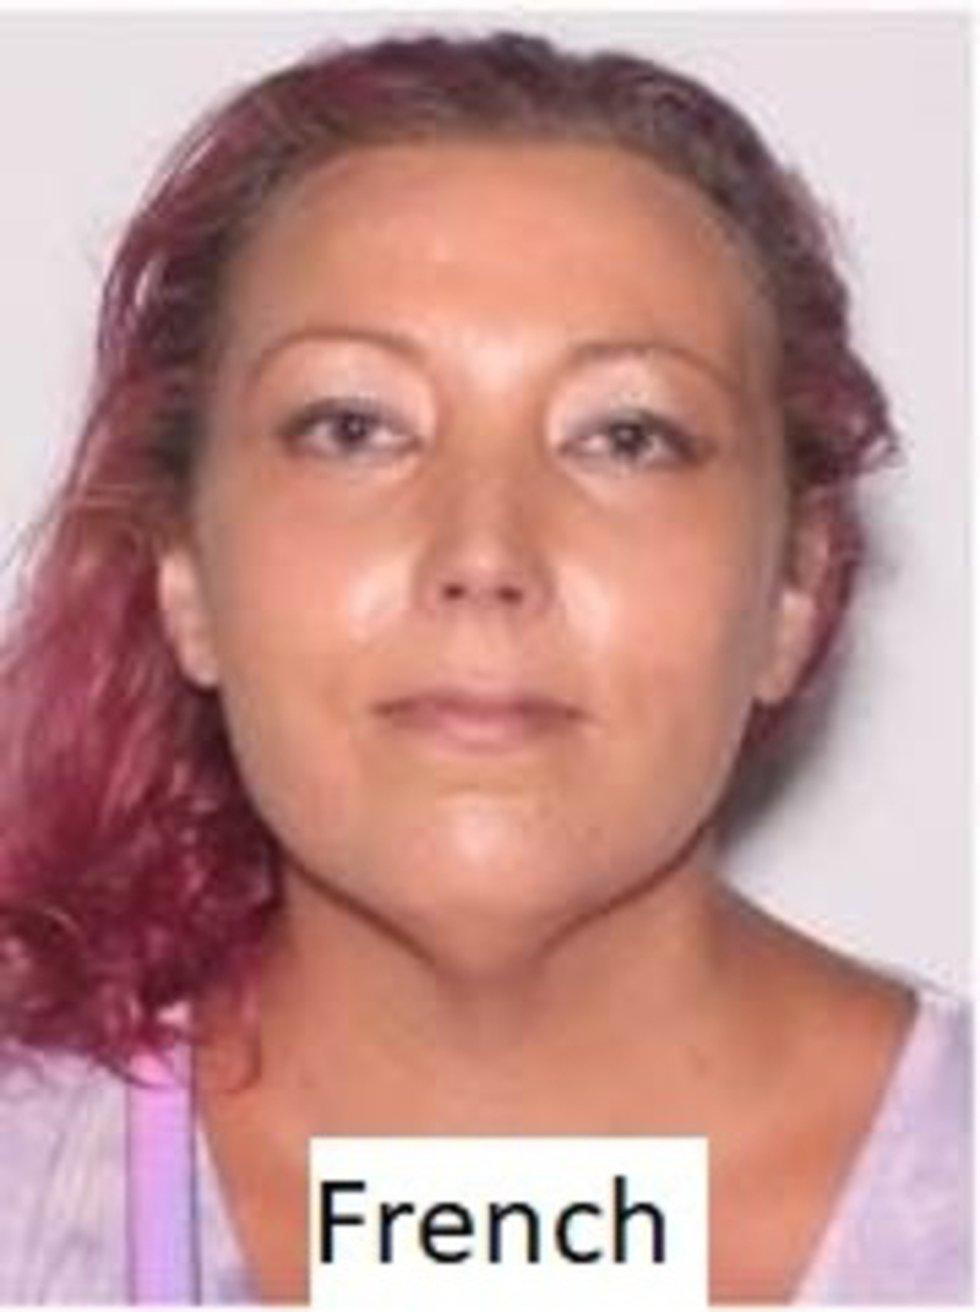 Christina French, 41